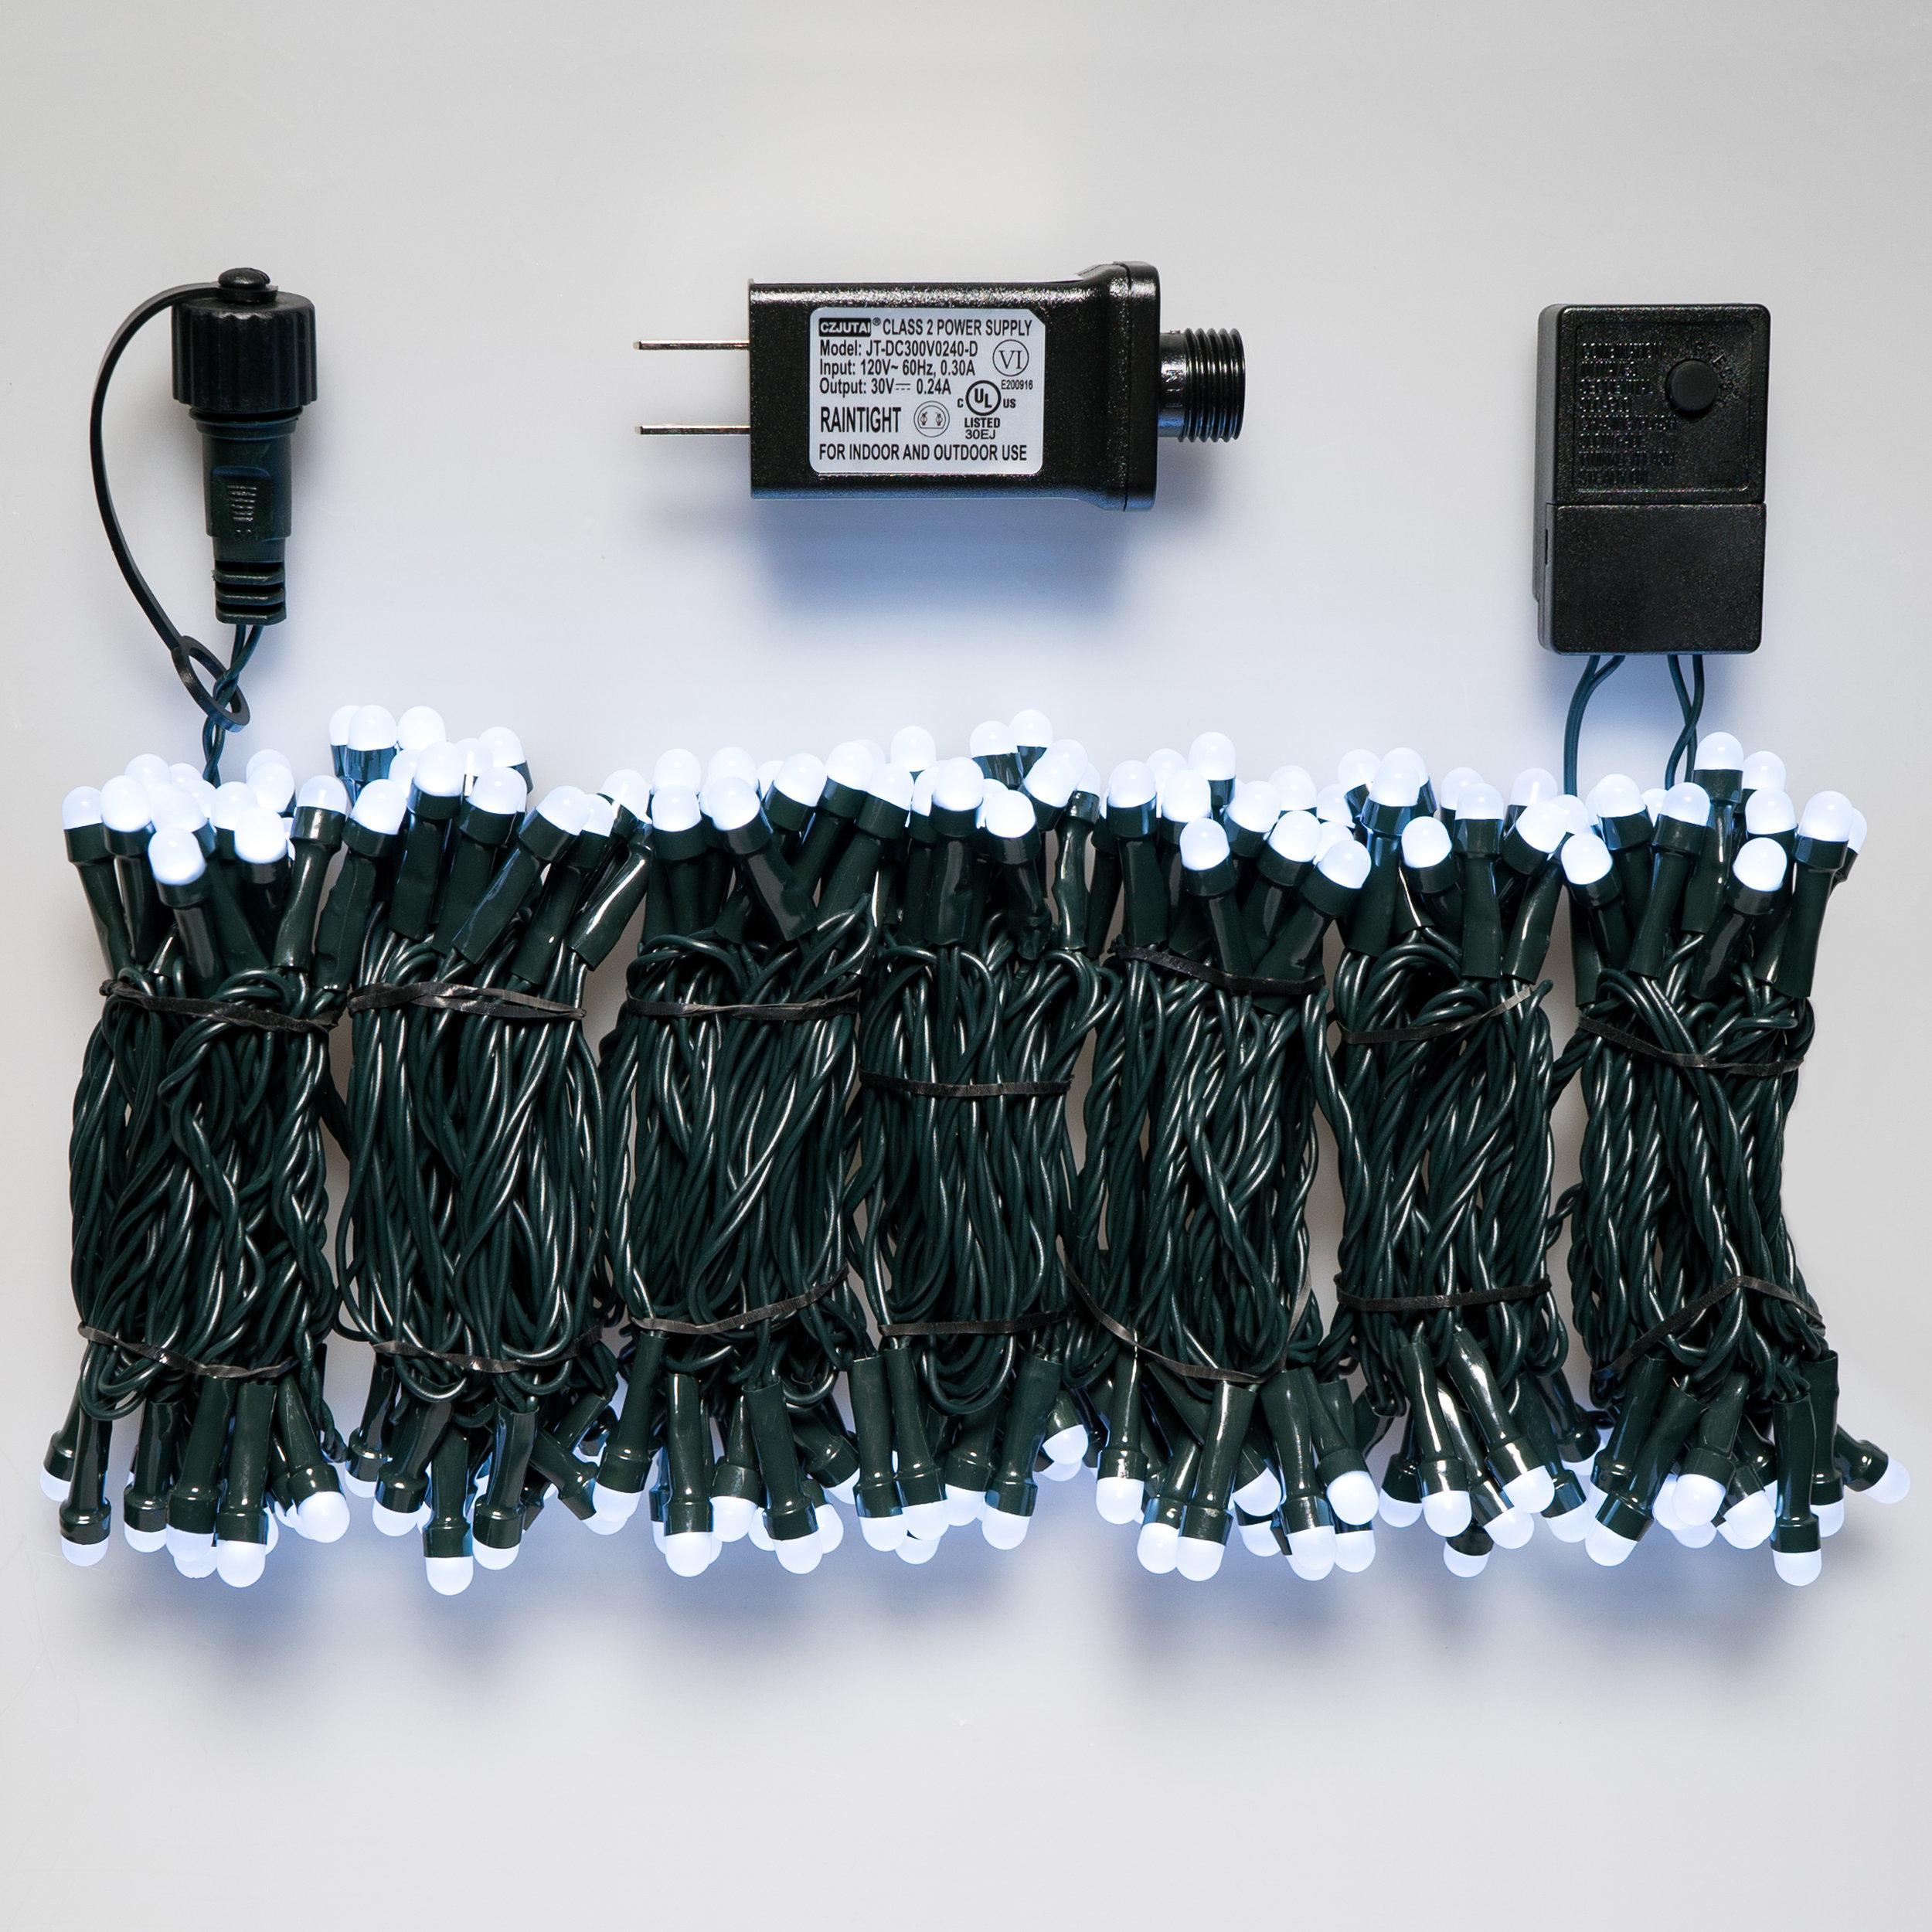 Novolink SL-200-8-BLE-CW String, Transformer and Controller